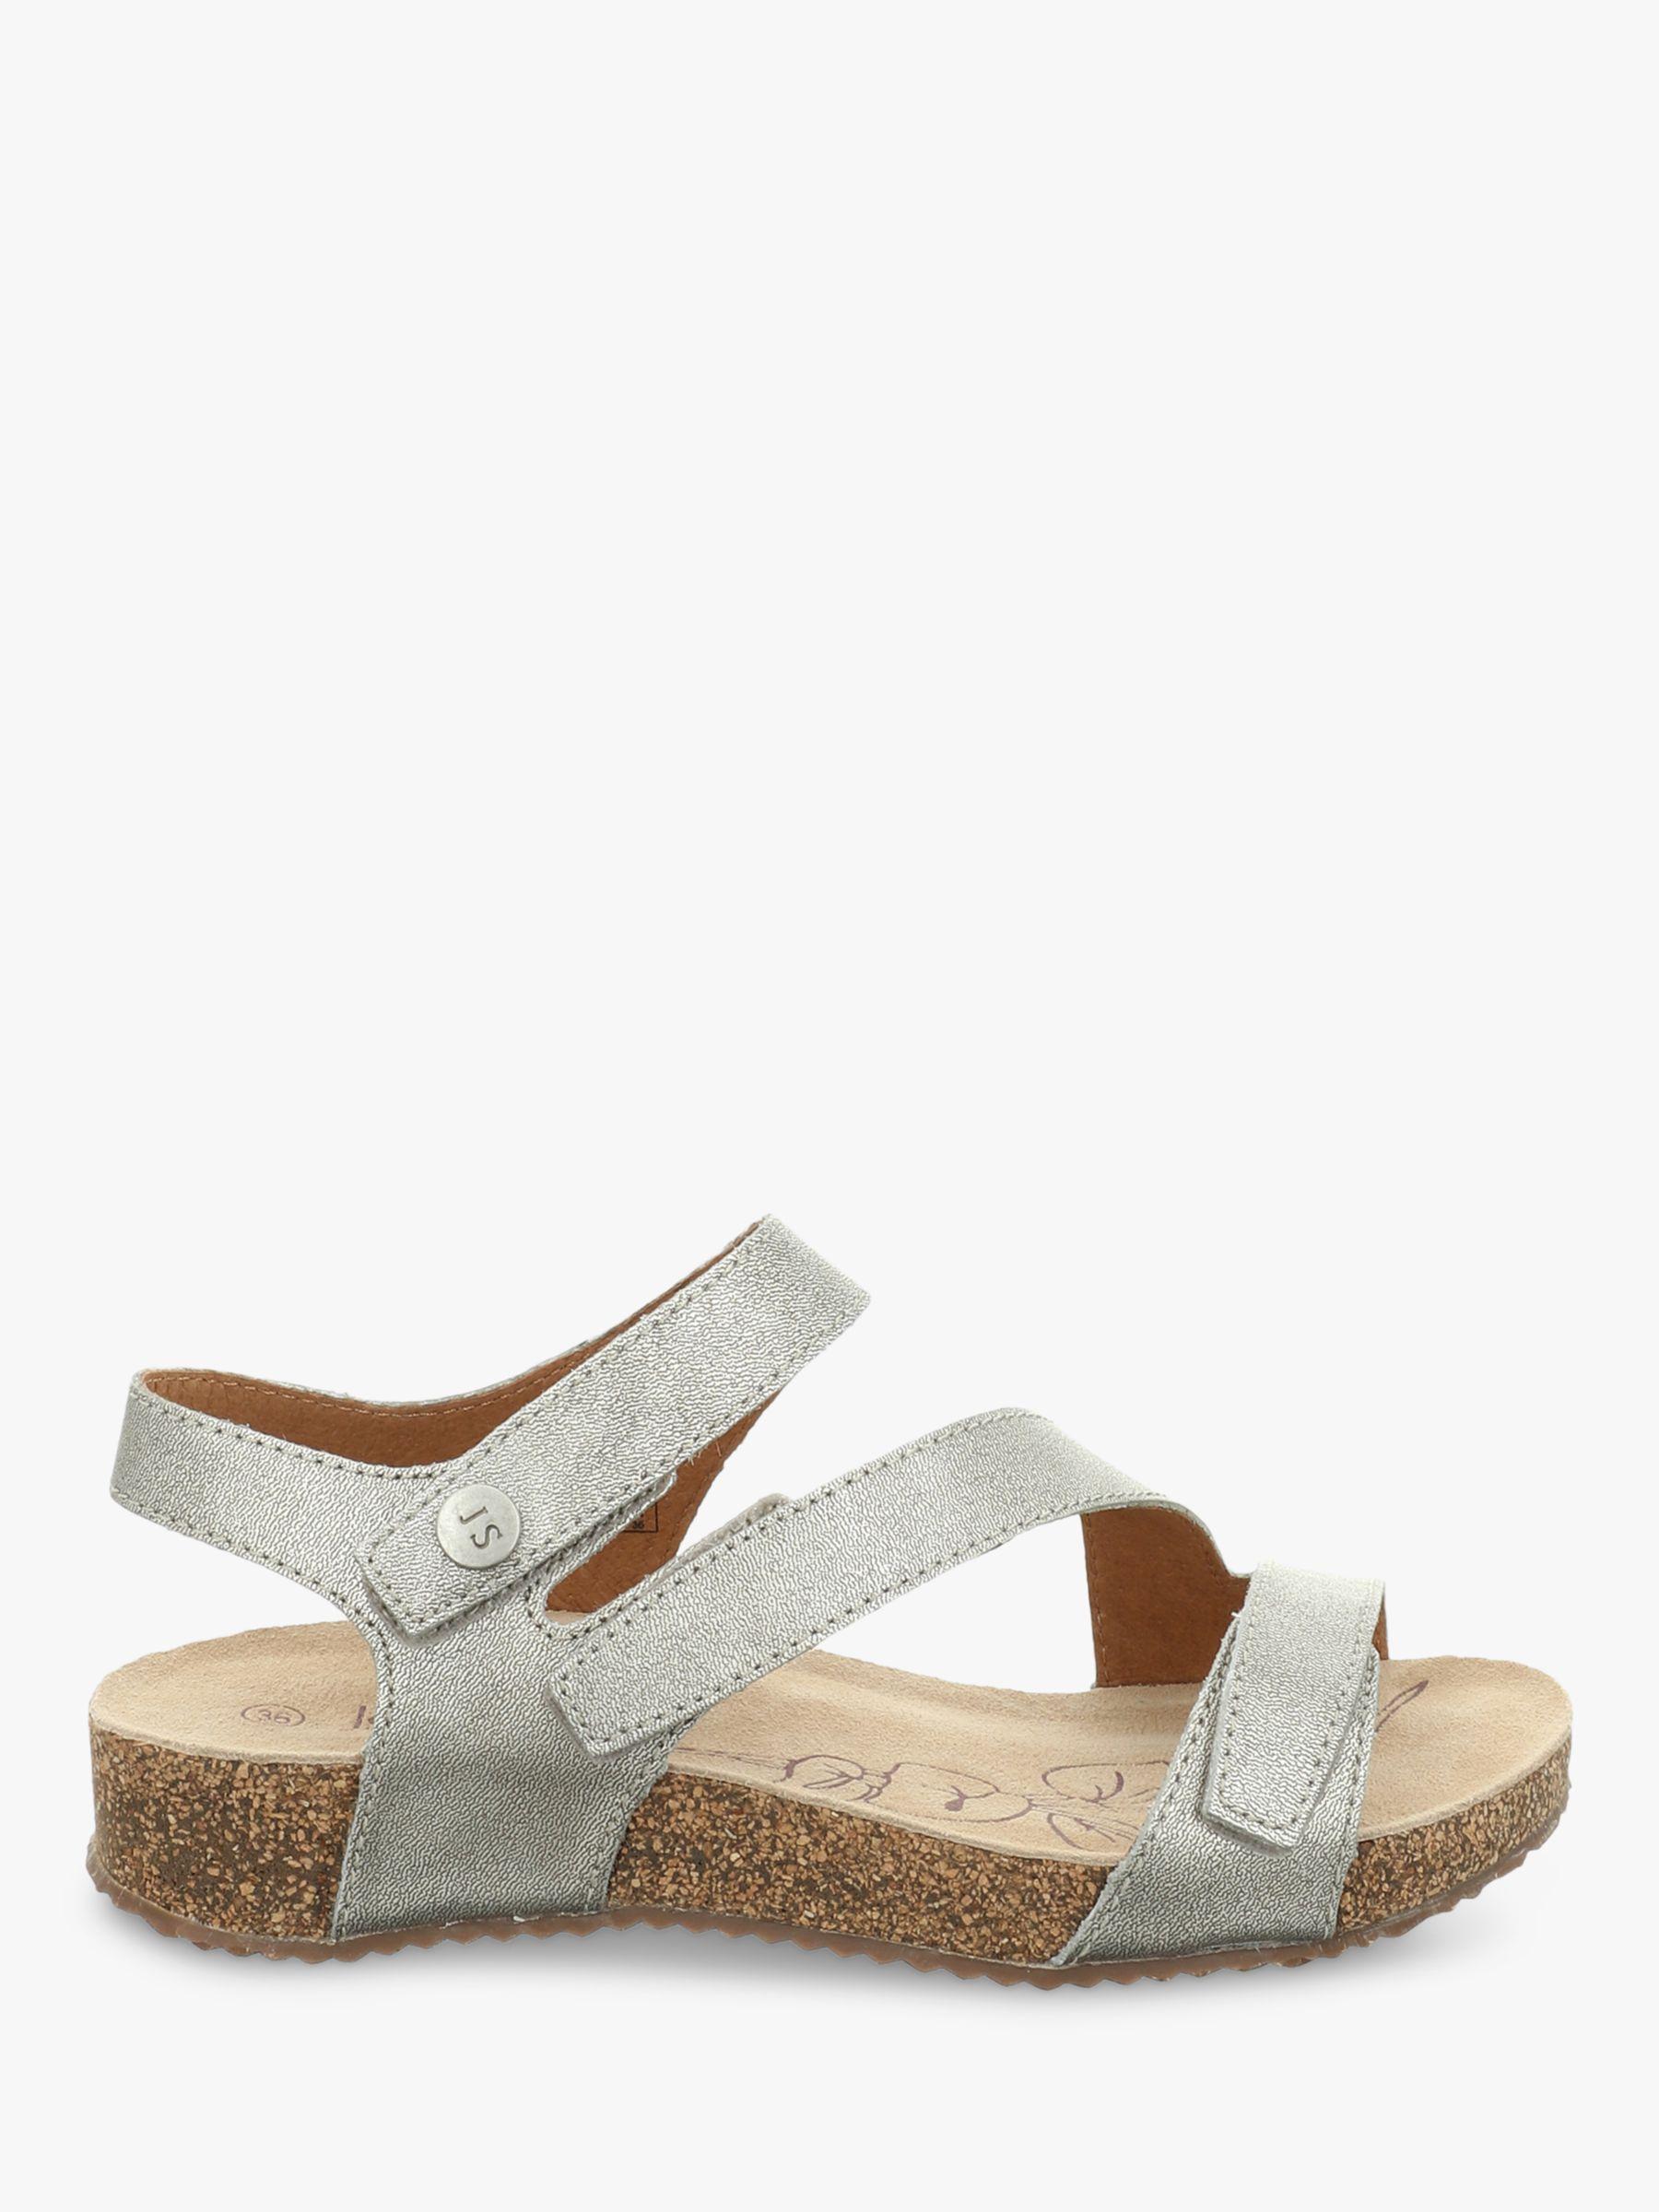 Josef Seibel Josef Seibel Tonga 25 Triple Strap Sandals, Silver